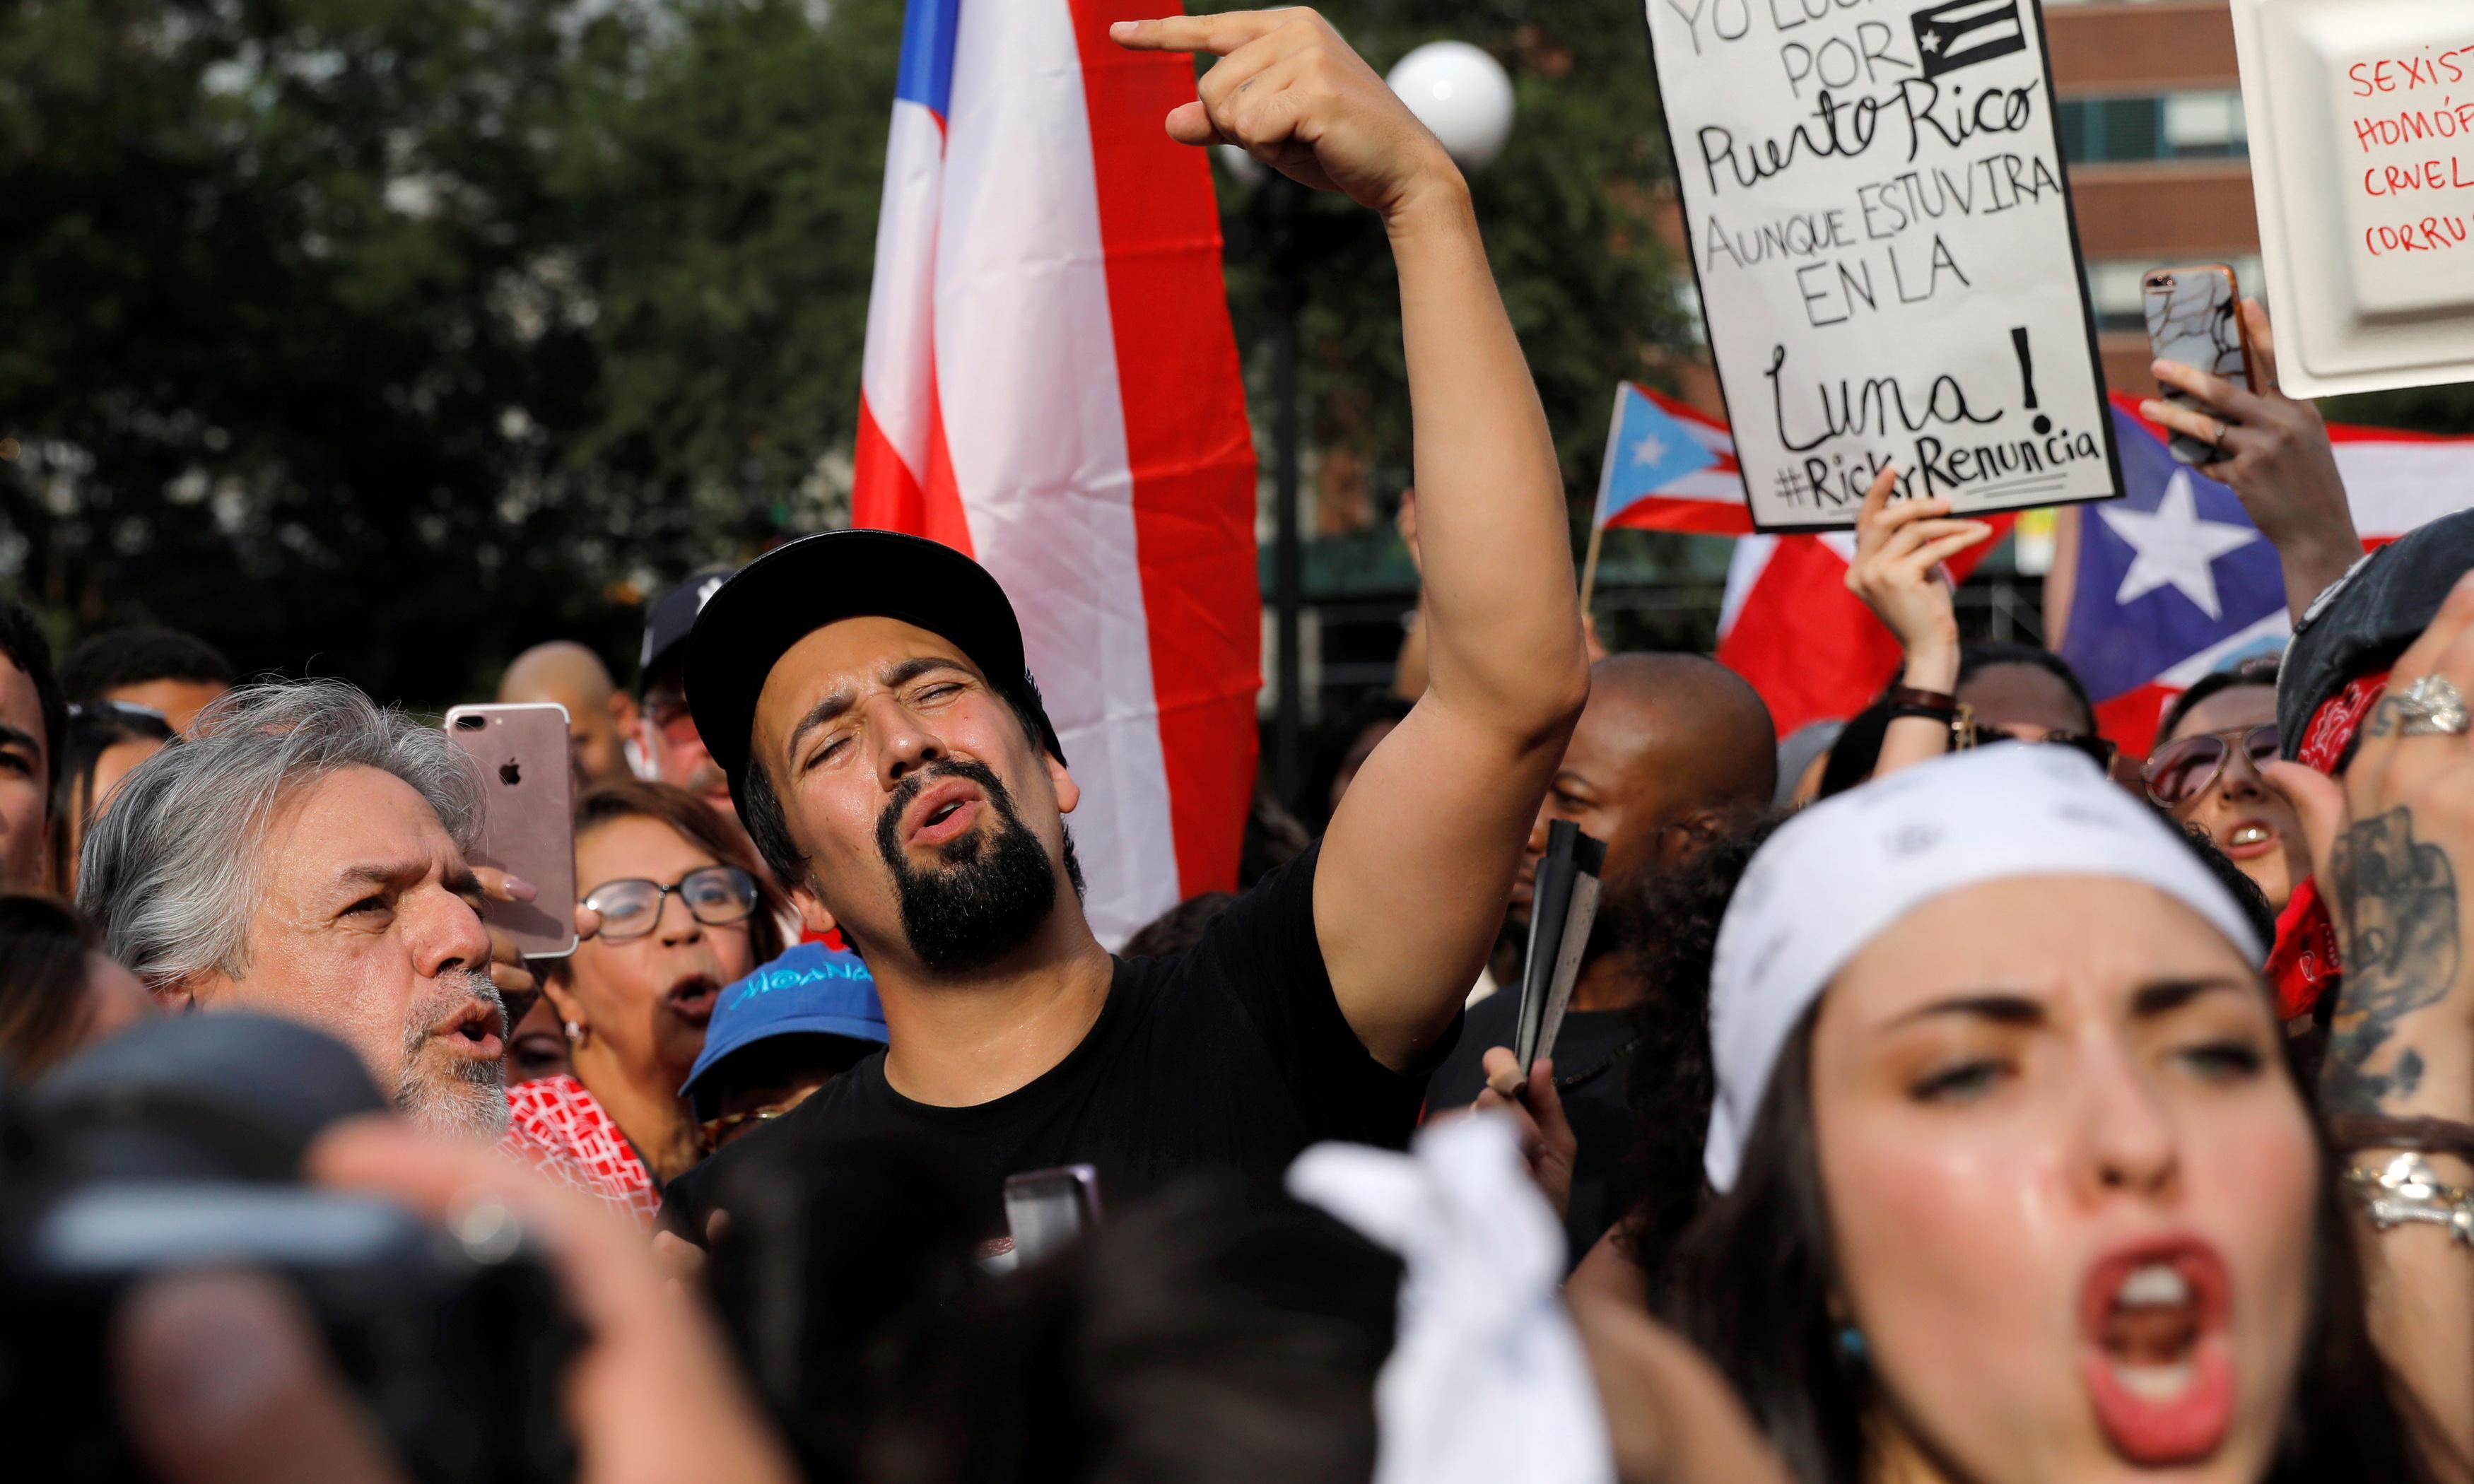 Lin-Manuel Miranda joins diaspora protests against Puerto Rico governor